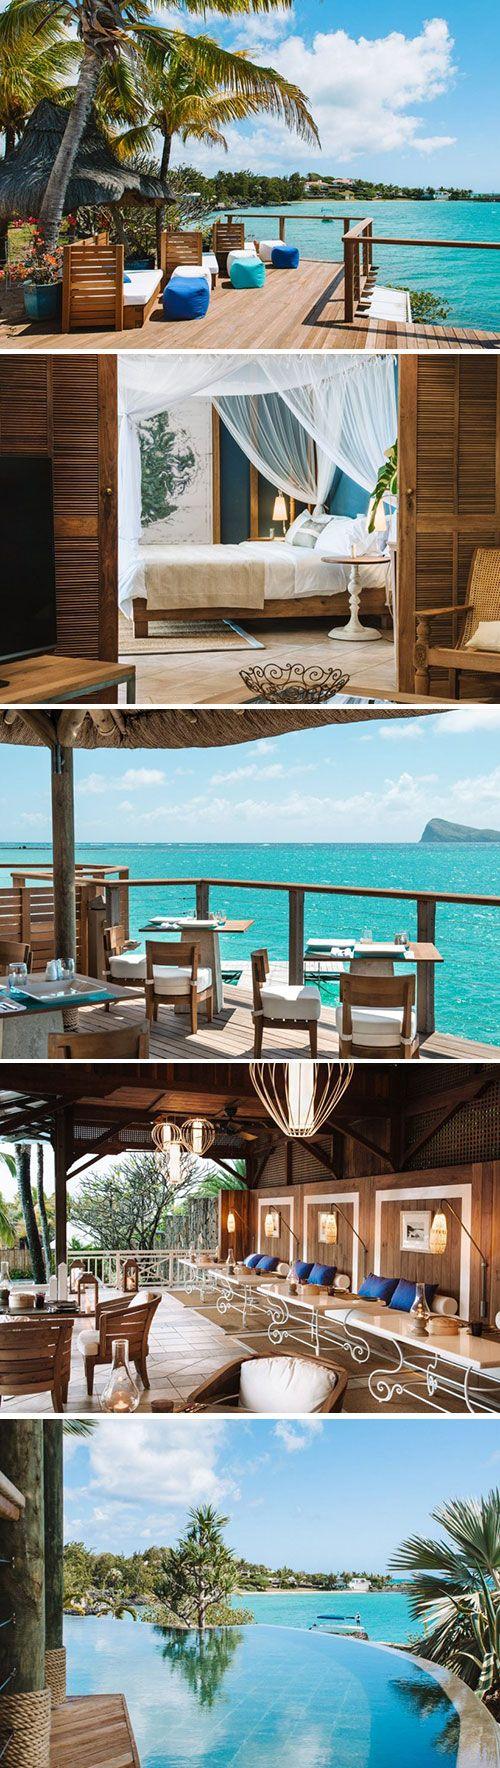 Paradijselijk, rustig (want adults only) en luxe; dat is Paradise Cove Boutique Hotel op Mauritius.